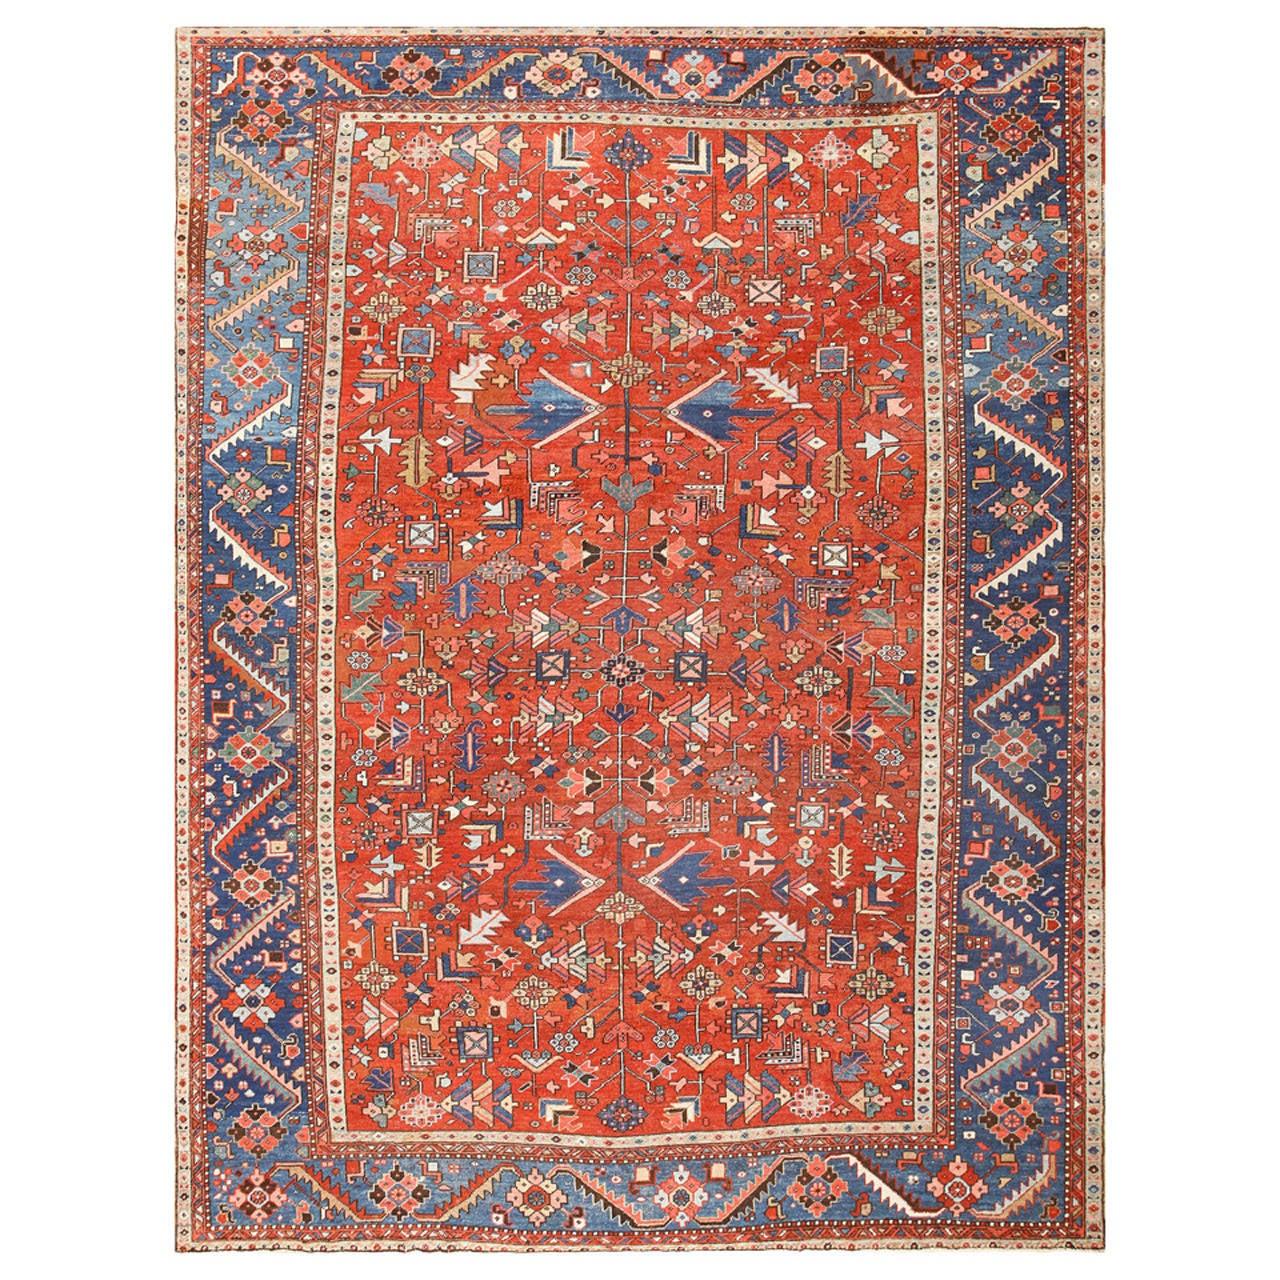 Antique Persian Heriz Serapi Rug at 1stdibs